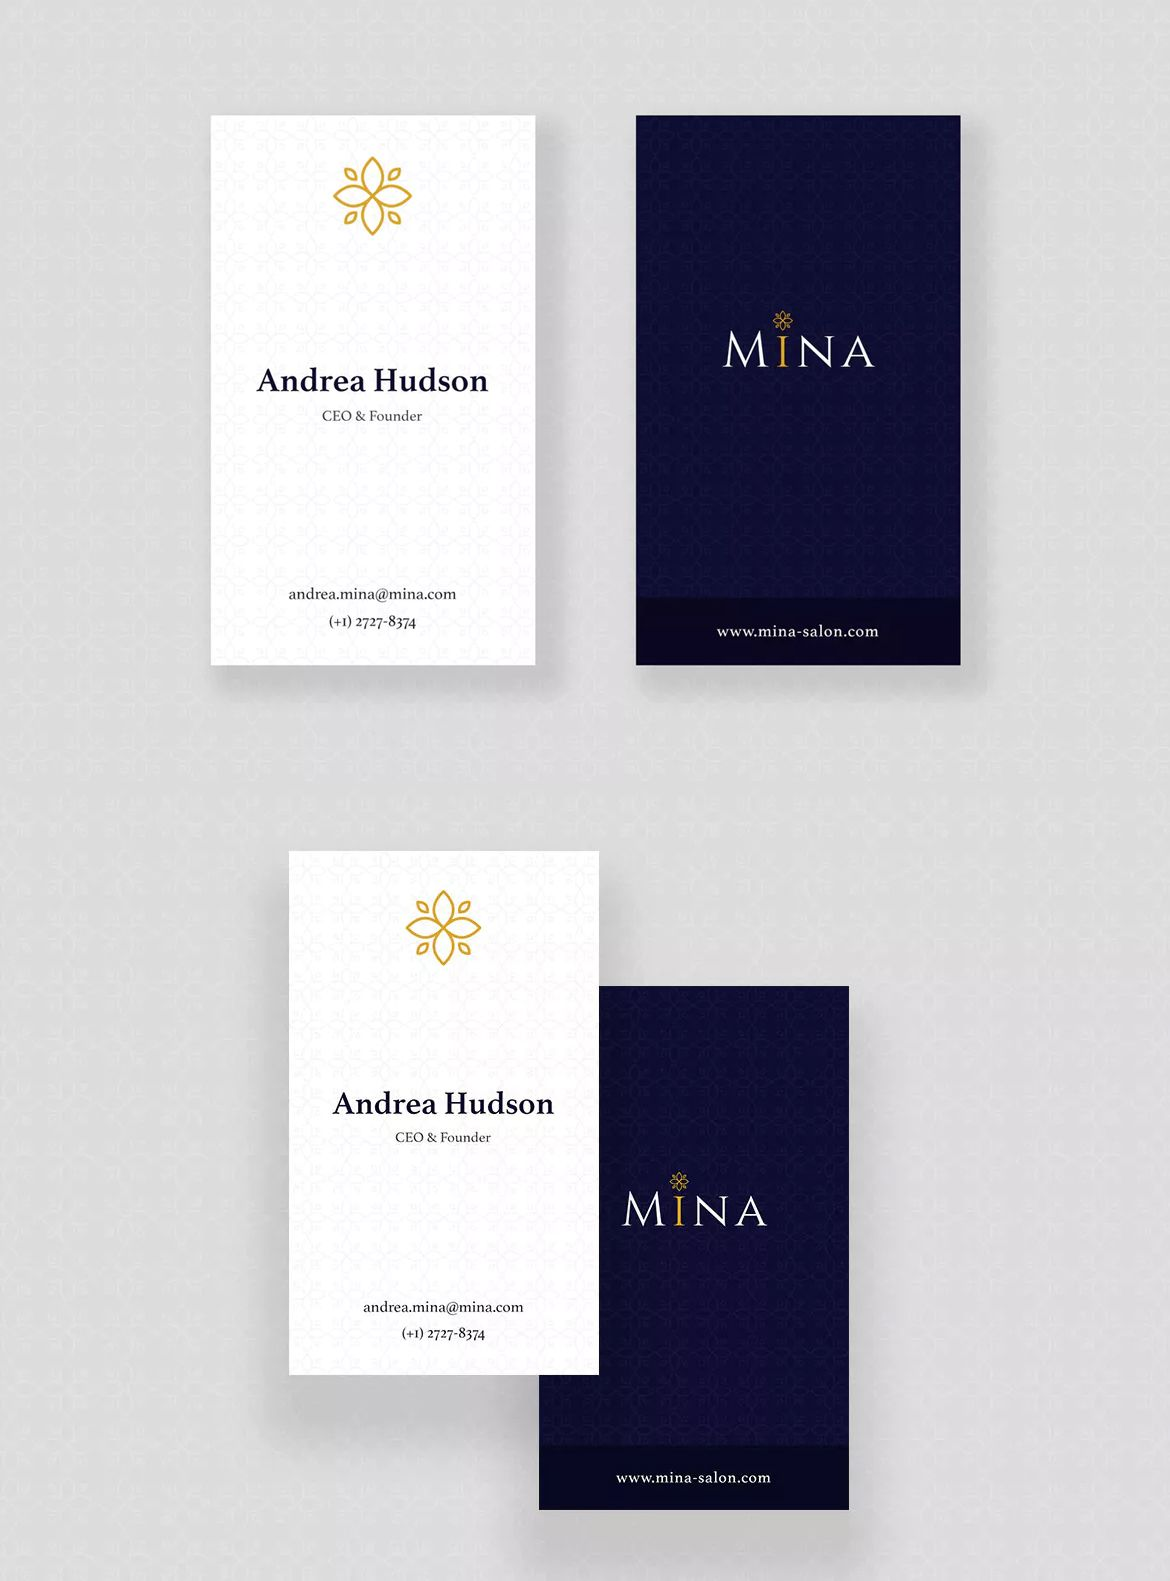 Mina Beauty - Business Card Template PSD | Business Card Templates ...